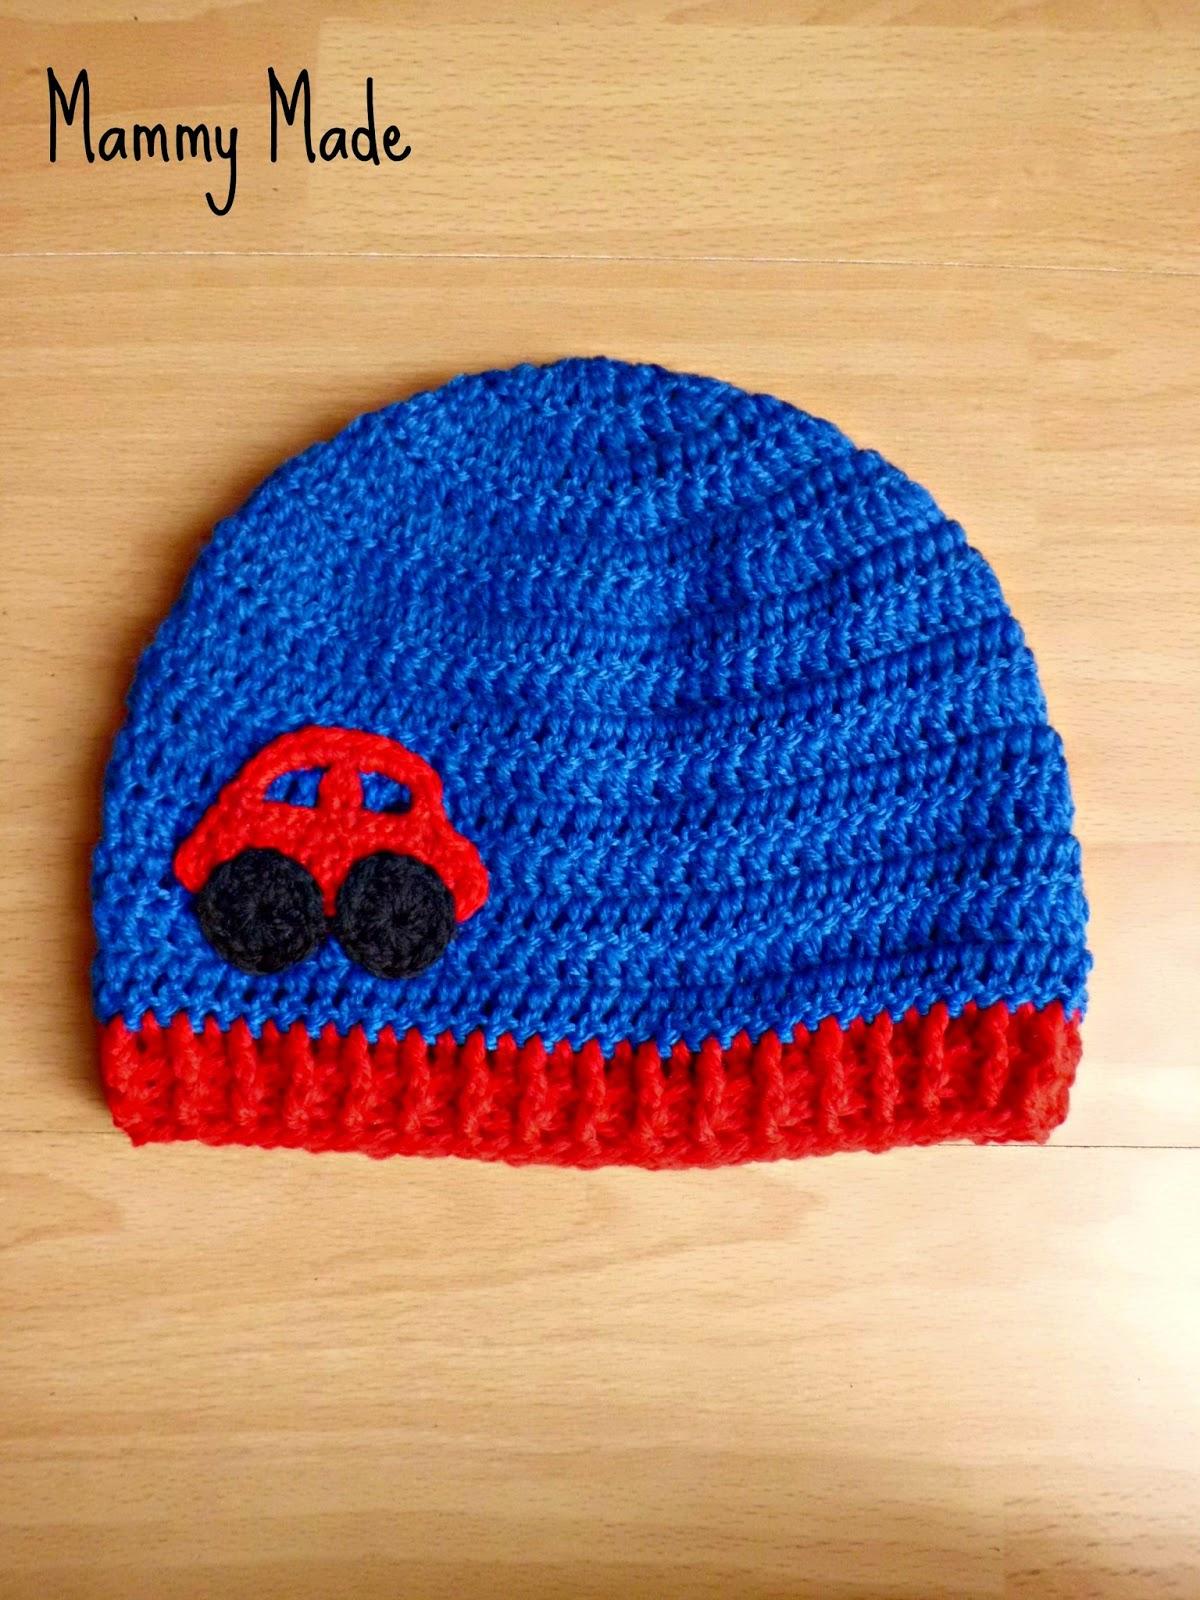 Mammy made crochet car appliqu crochet car appliqu bankloansurffo Choice Image